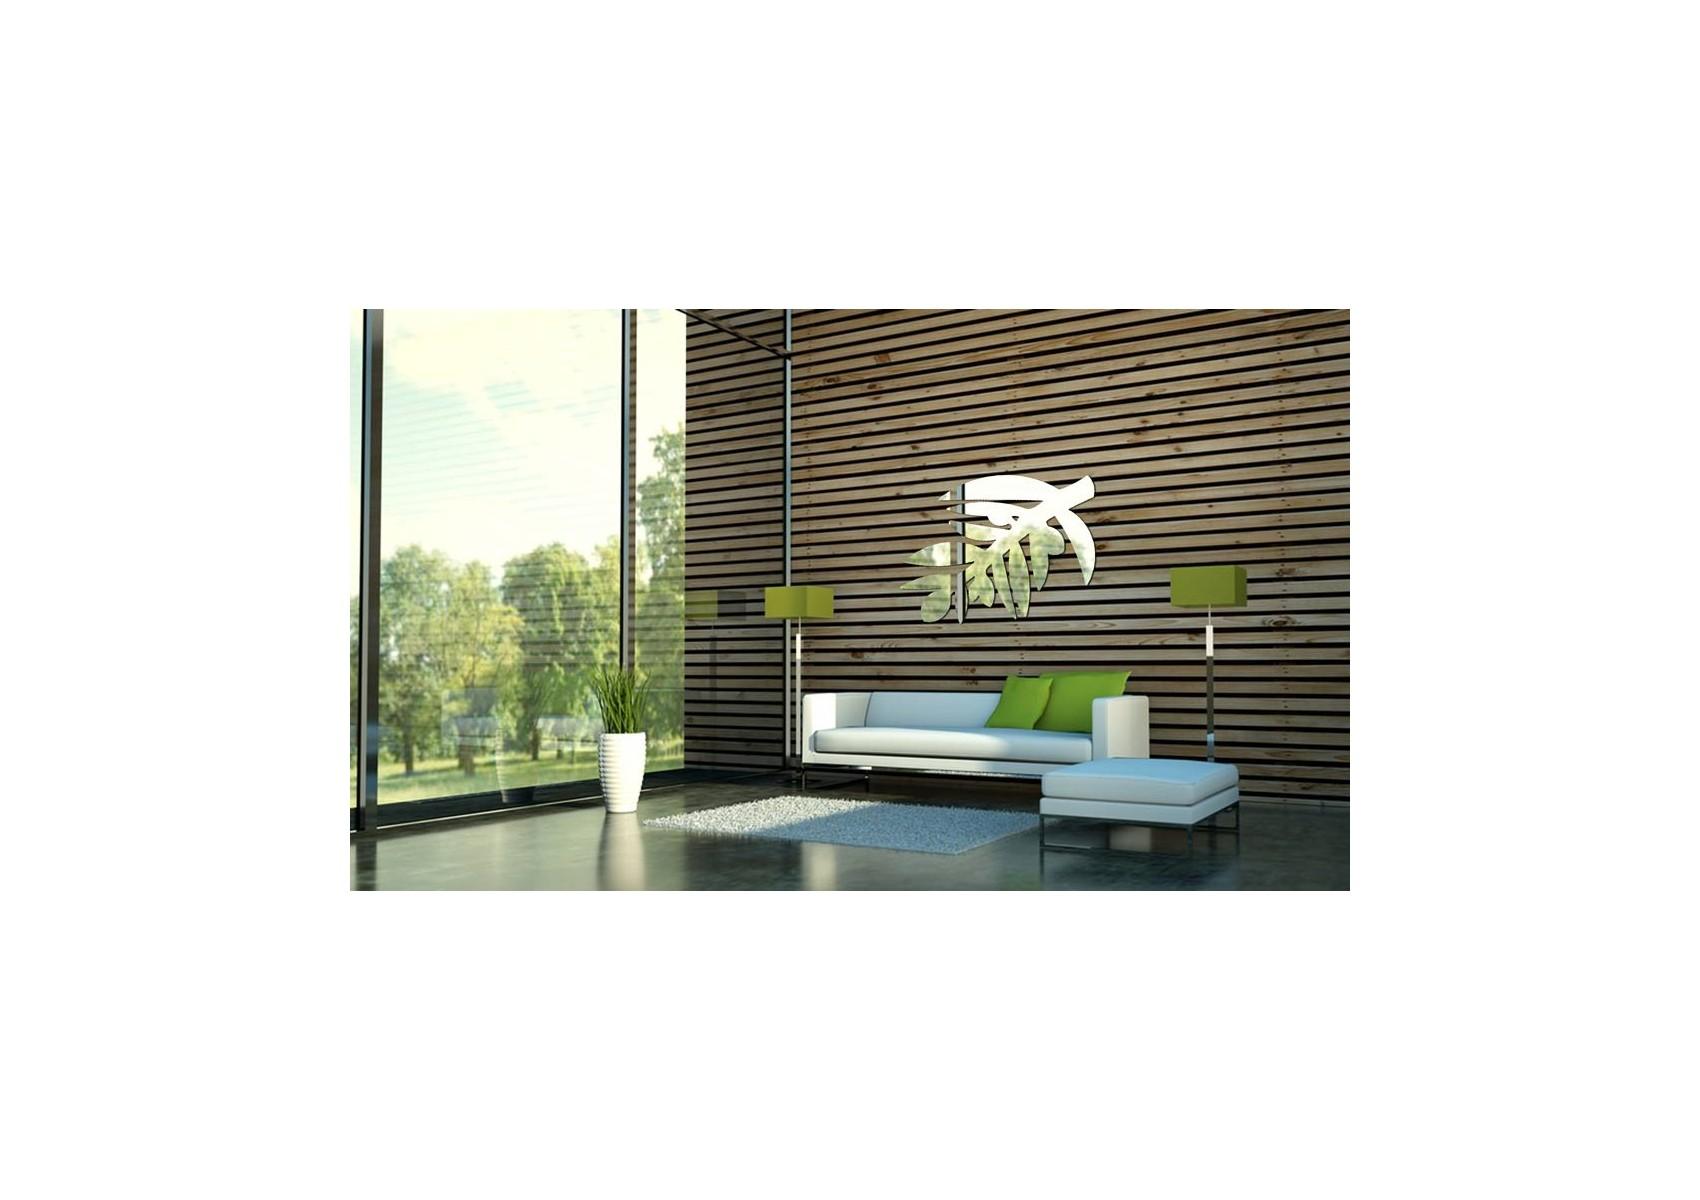 Miroir rameau d'olivier - design deco